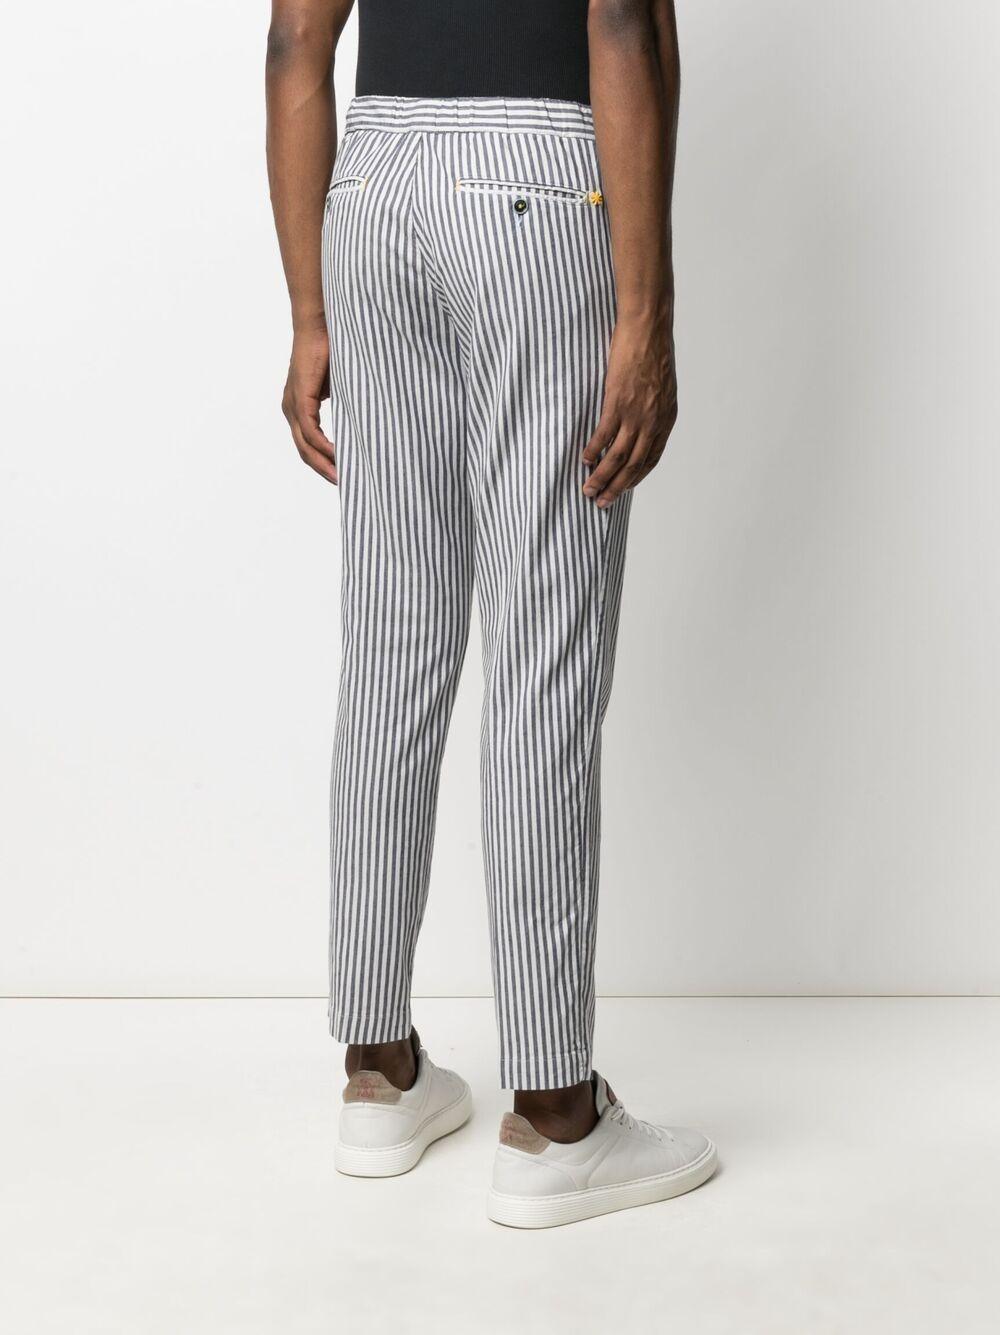 Pantaloni a righe blu navy e bianco in cotone a a righe verticali MANUEL RITZ | Pantaloni | 3032P1618L-21302189